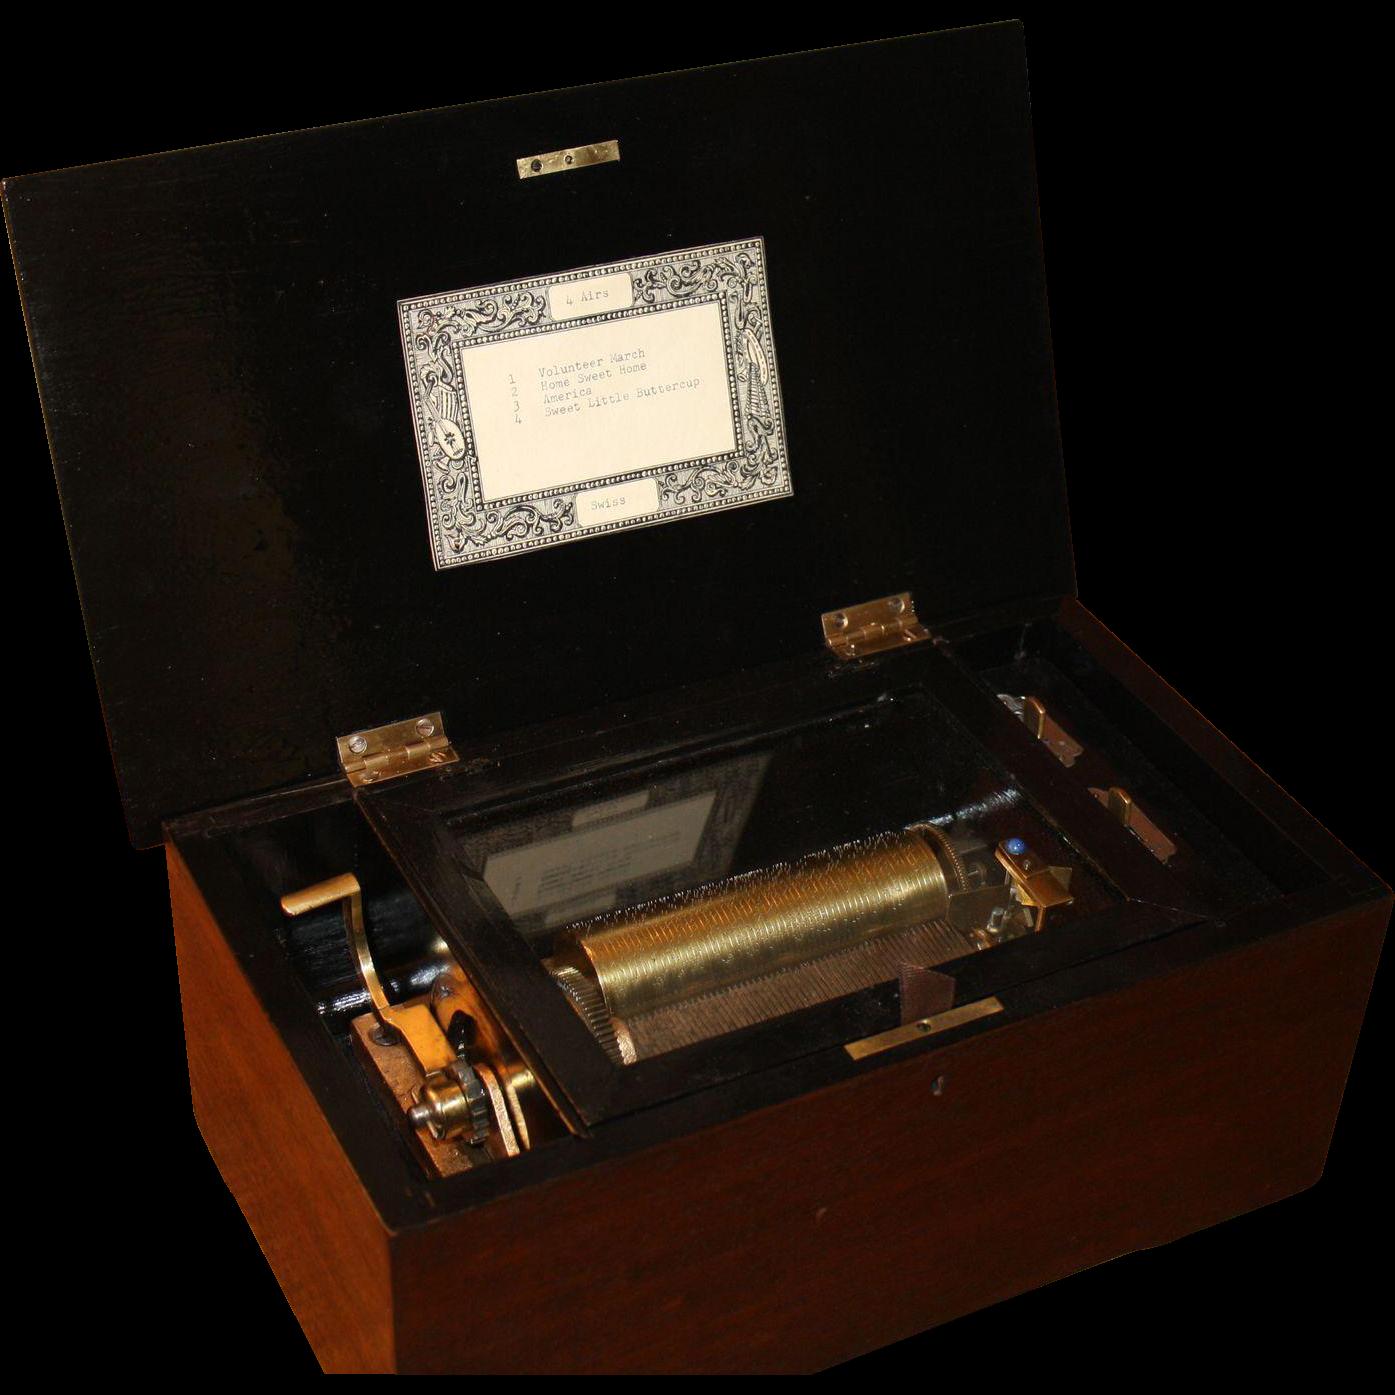 Antique 4 Tune Swiss Cylinder Music Box 1860-1890's